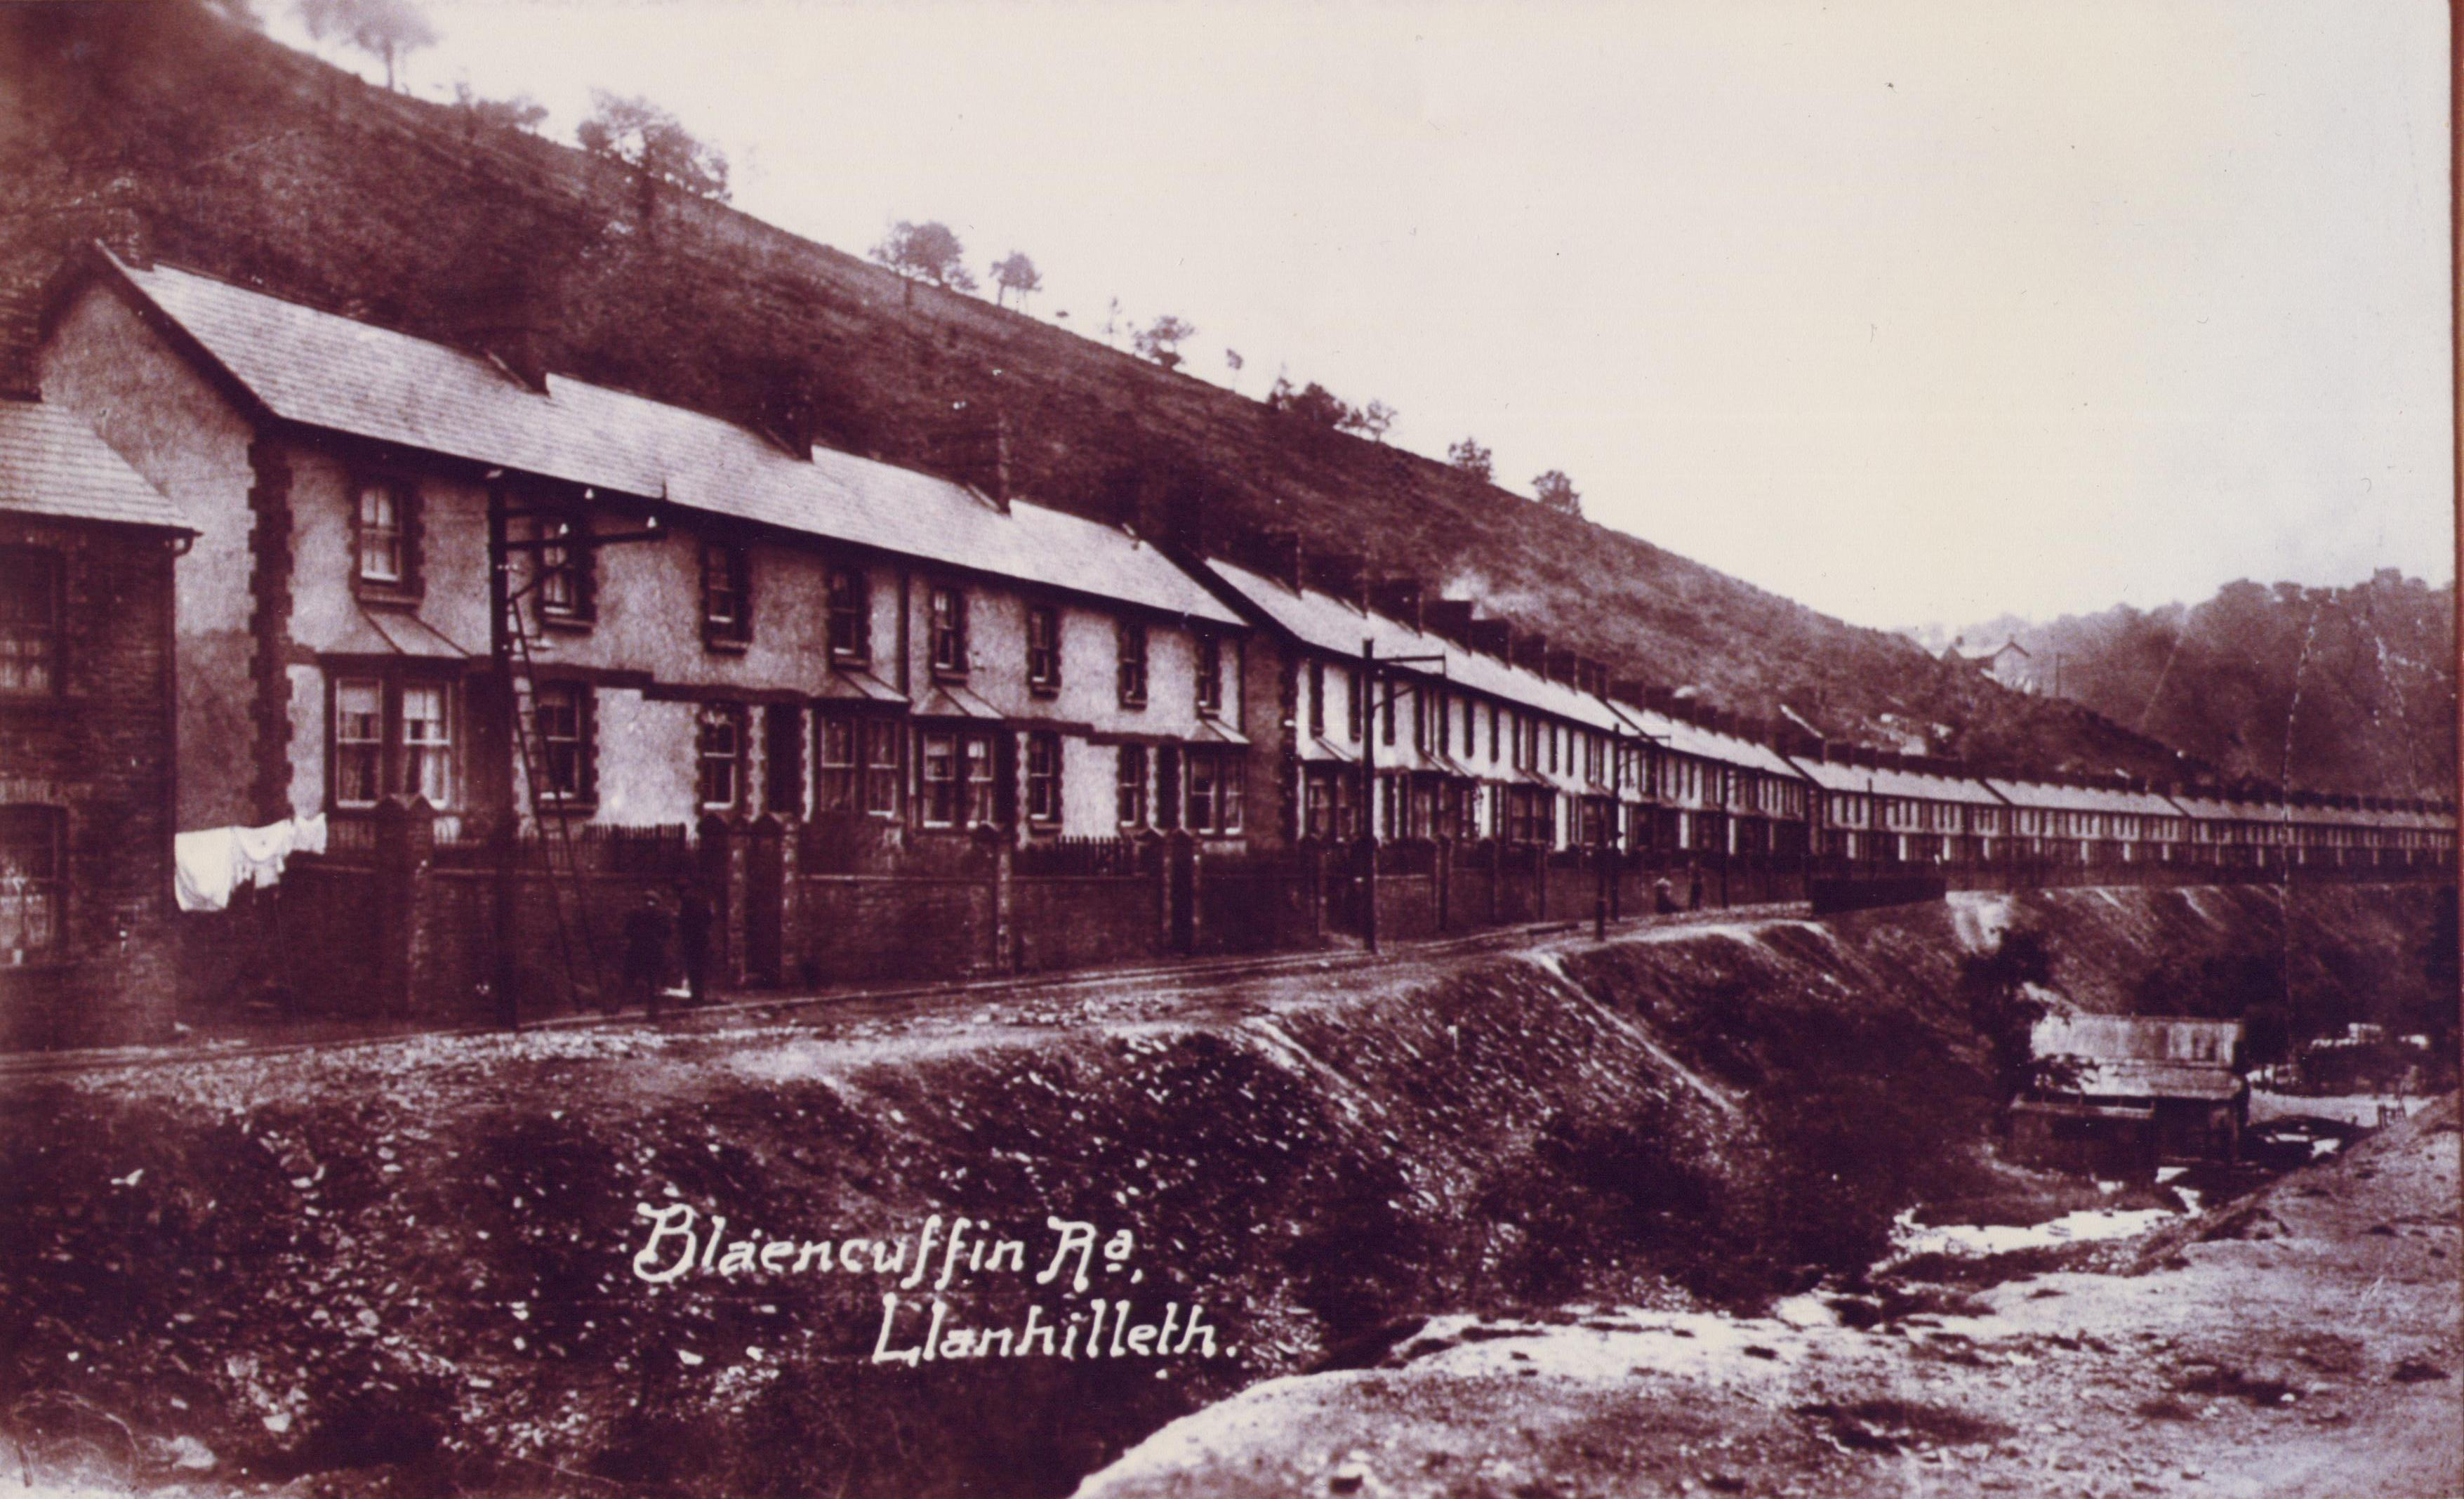 Blaencuffin Road, Llanhilleth